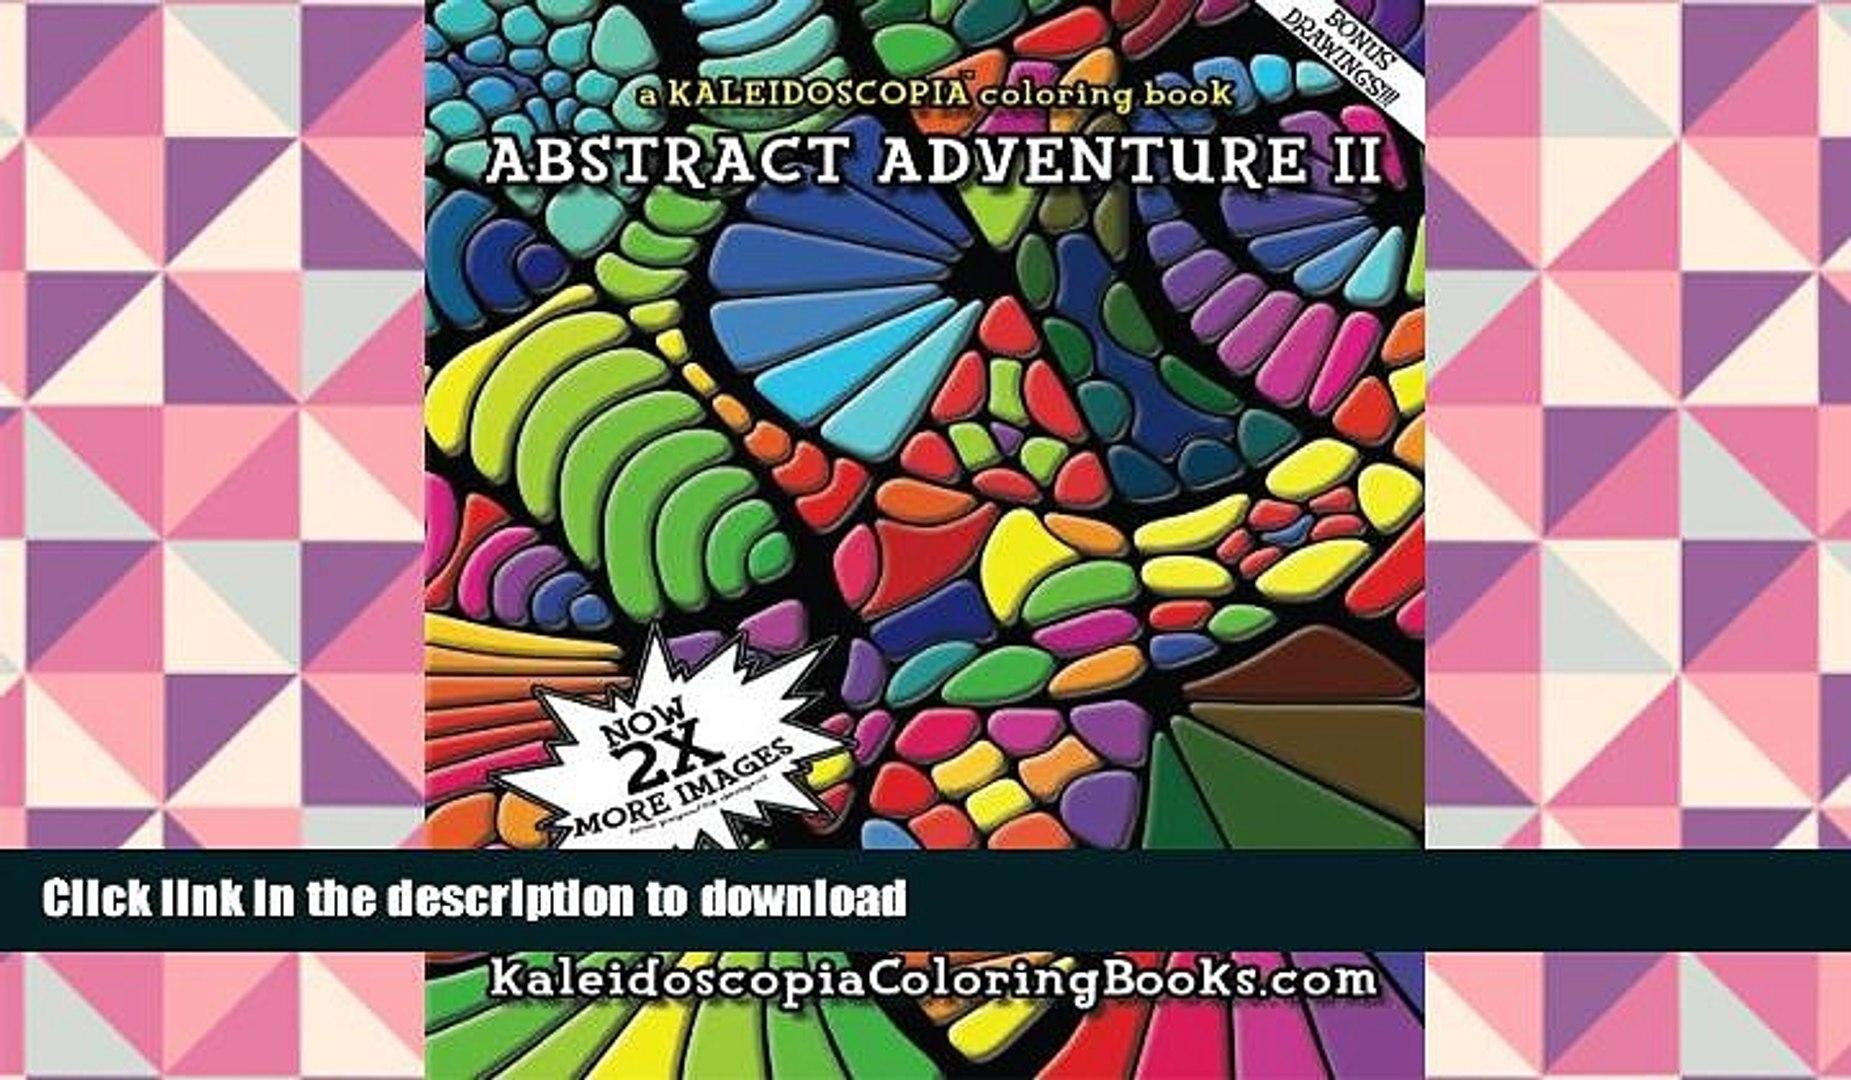 FREE [DOWNLOAD] Abstract Adventure II: A Kaleidoscopia Coloring Book  (Volume 2) BOOK ONLINE